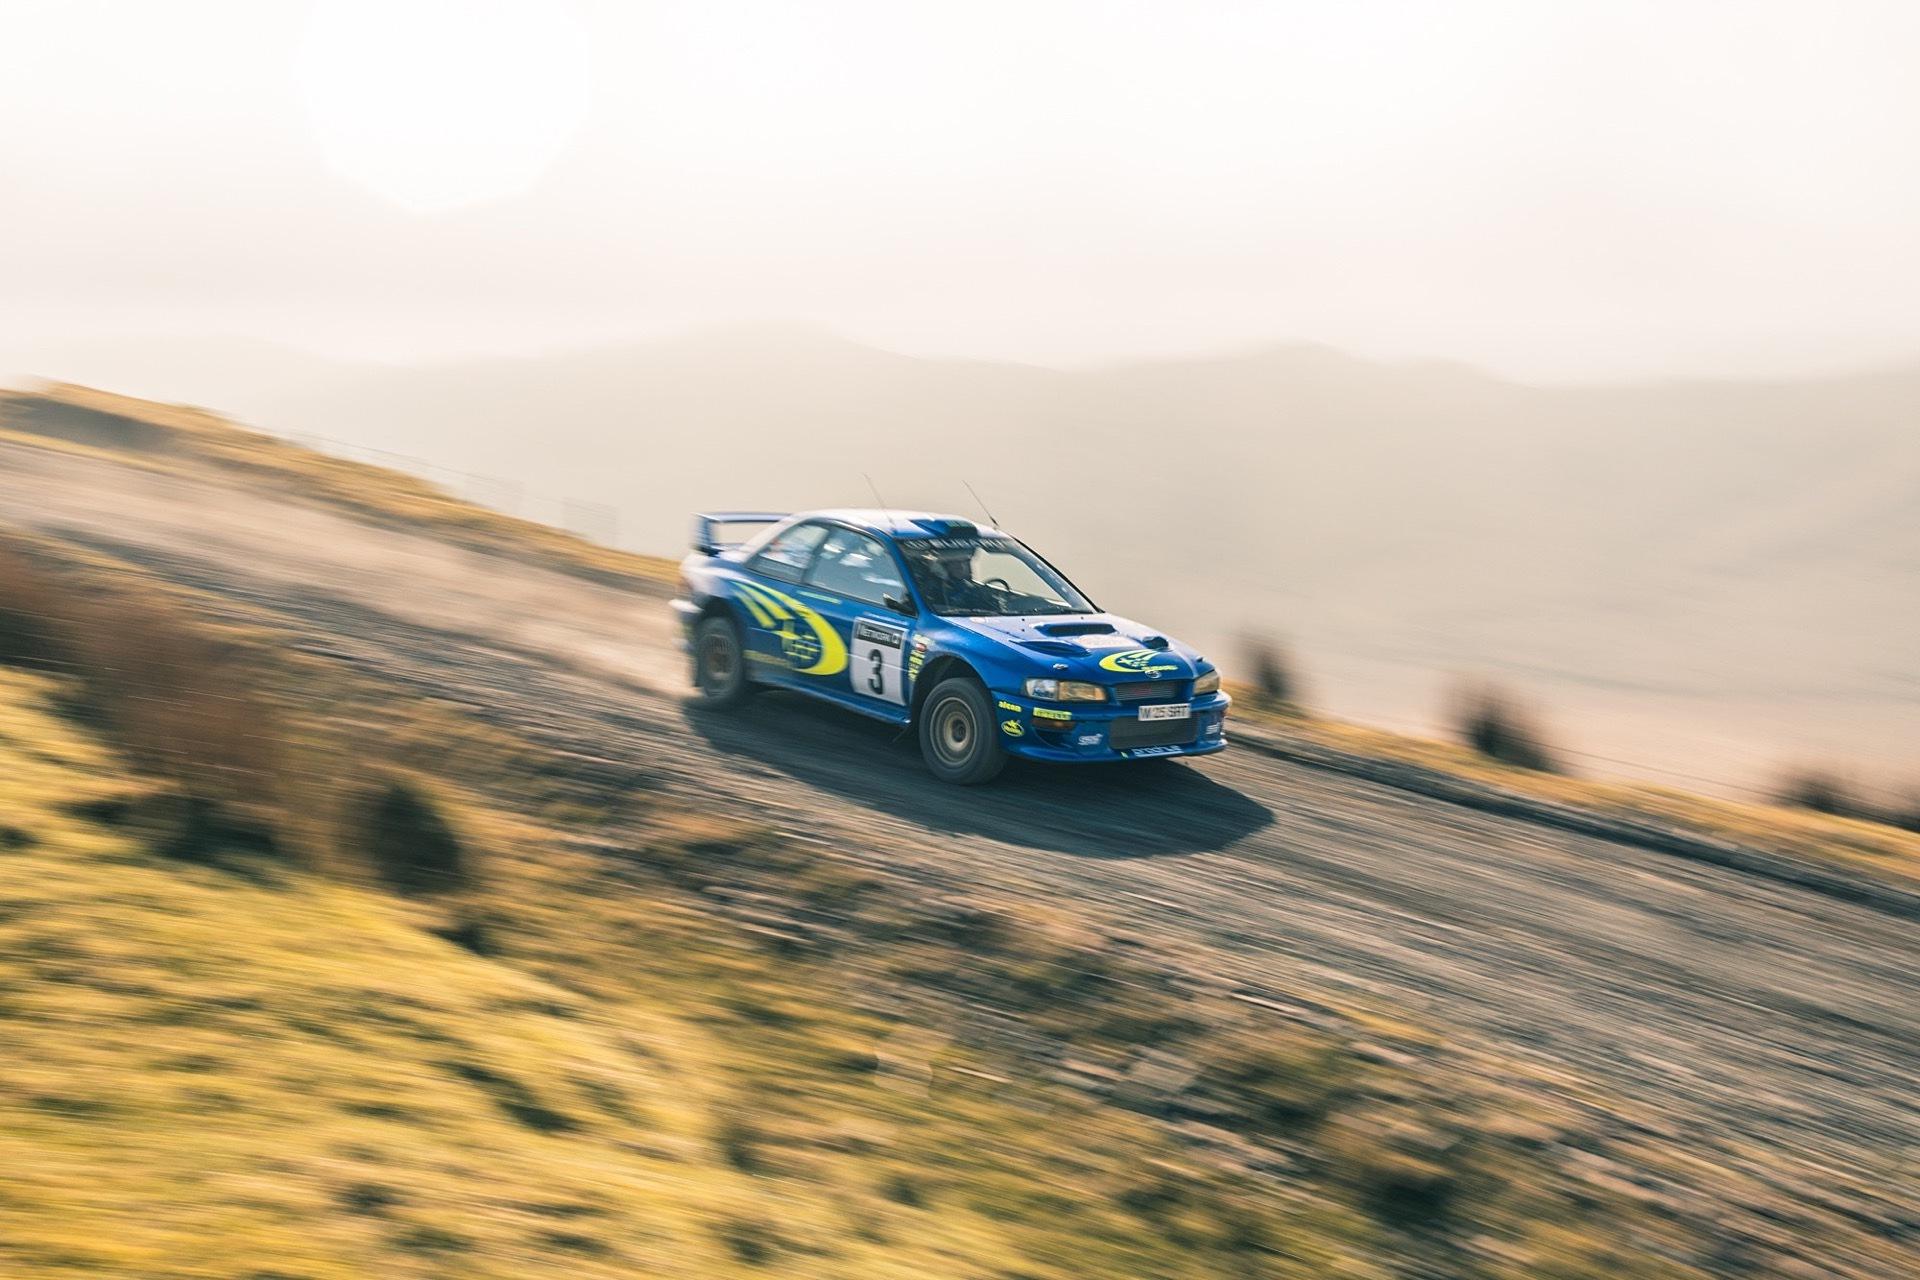 Richard_Burns_Subaru_Impreza_WRC_sale-0017